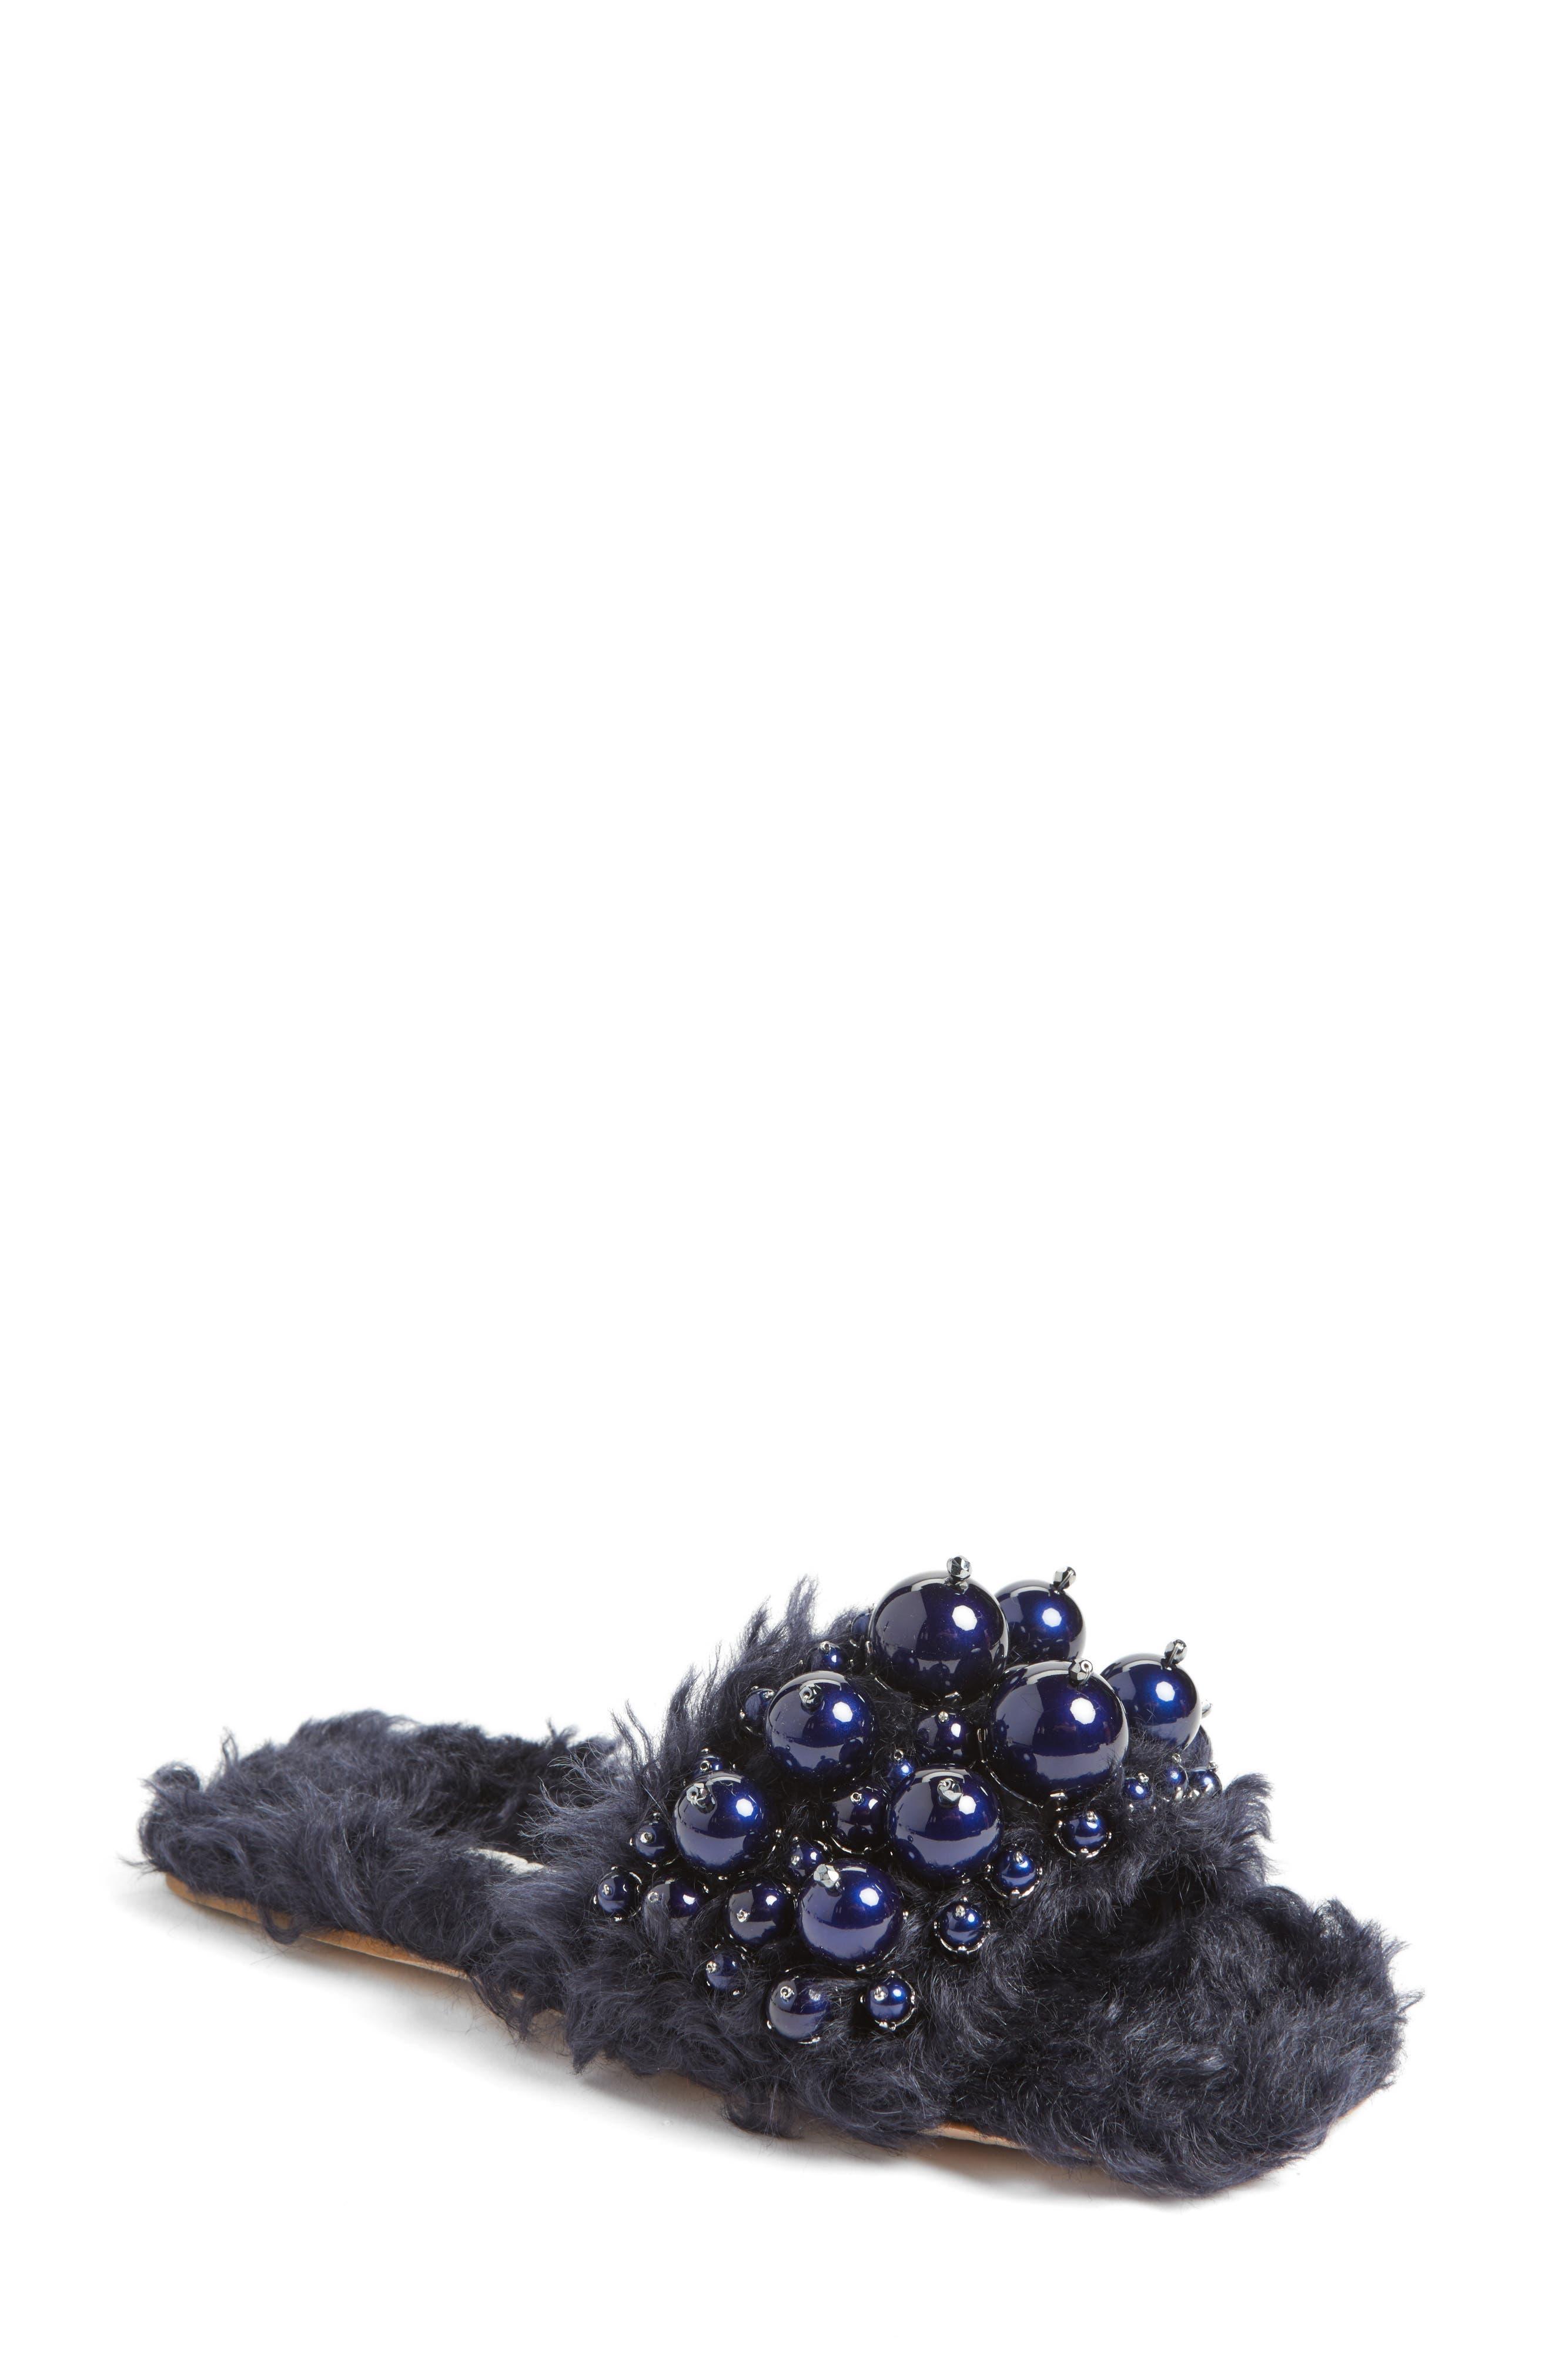 Alternate Image 1 Selected - Miu Miu Embellished Faux Fur Slipper (Women)